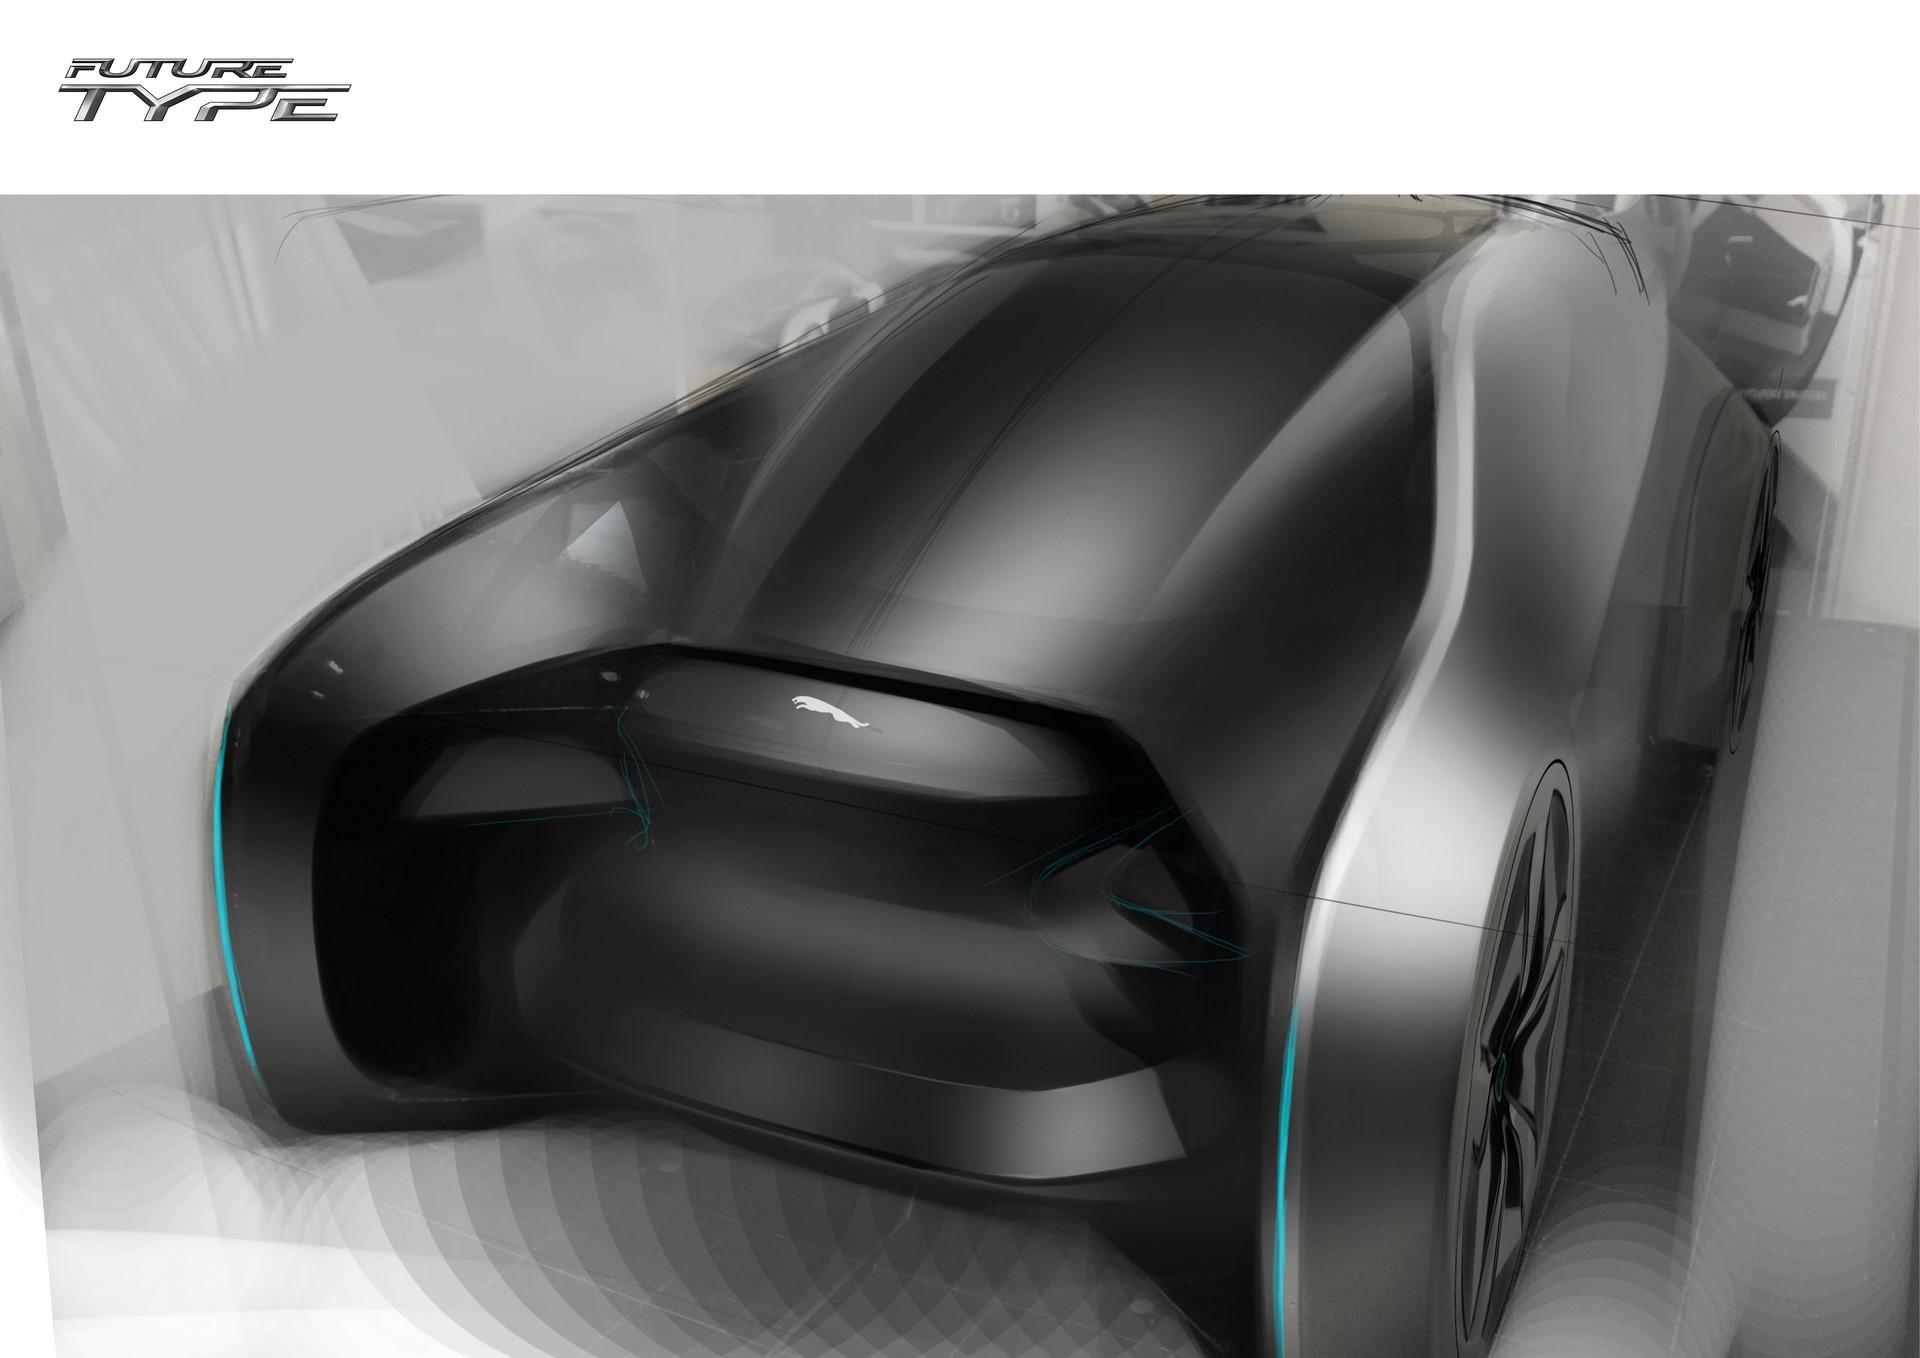 Future Type8